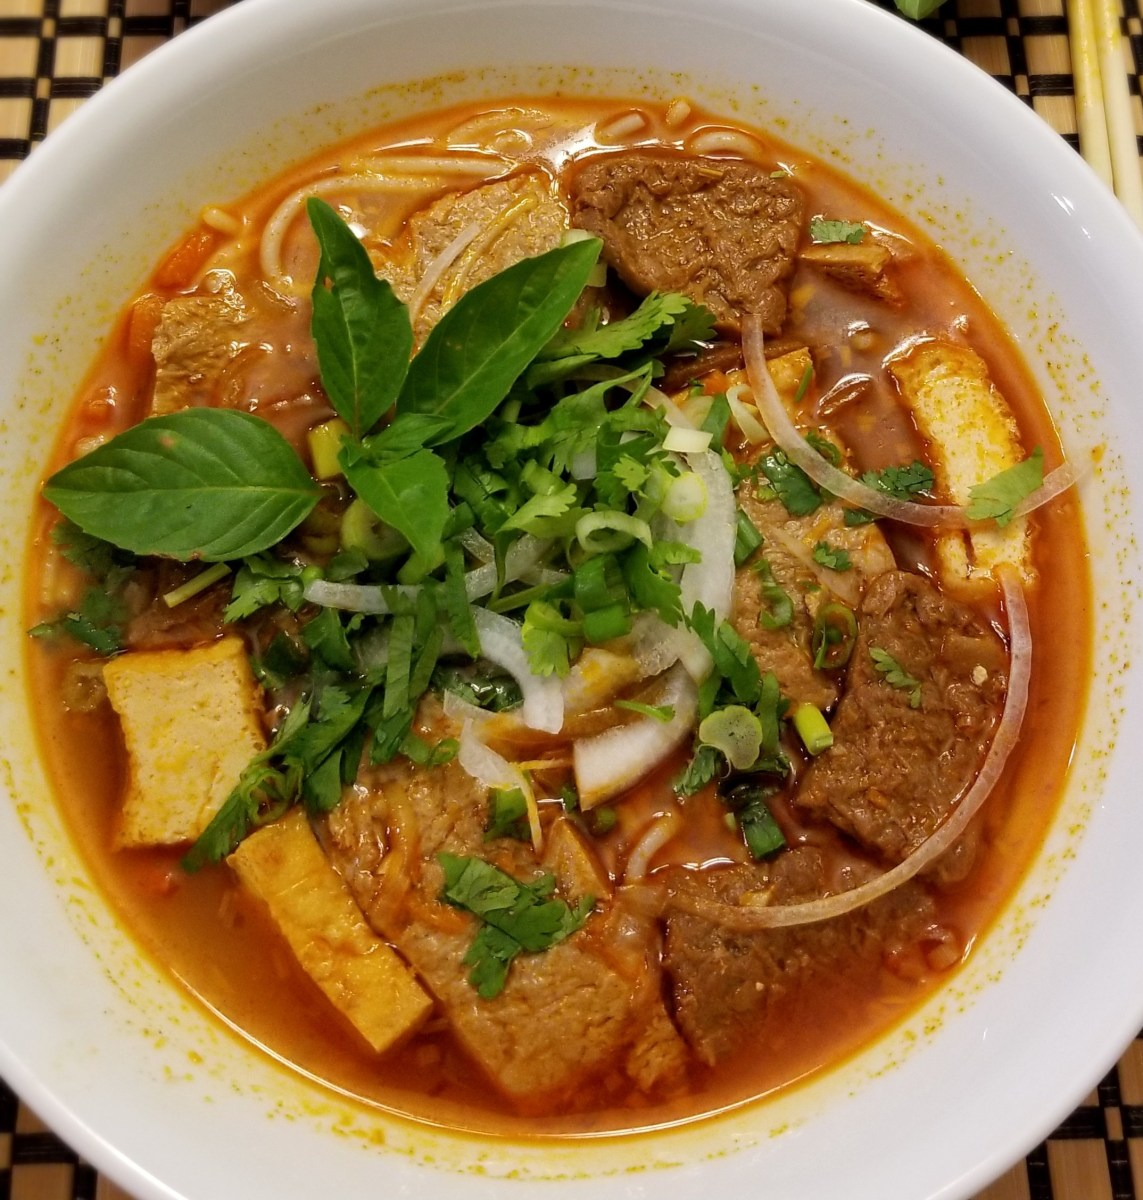 New Recipe: BÚN HUẾ CHAY INSTANT POT (VIETNAMESE